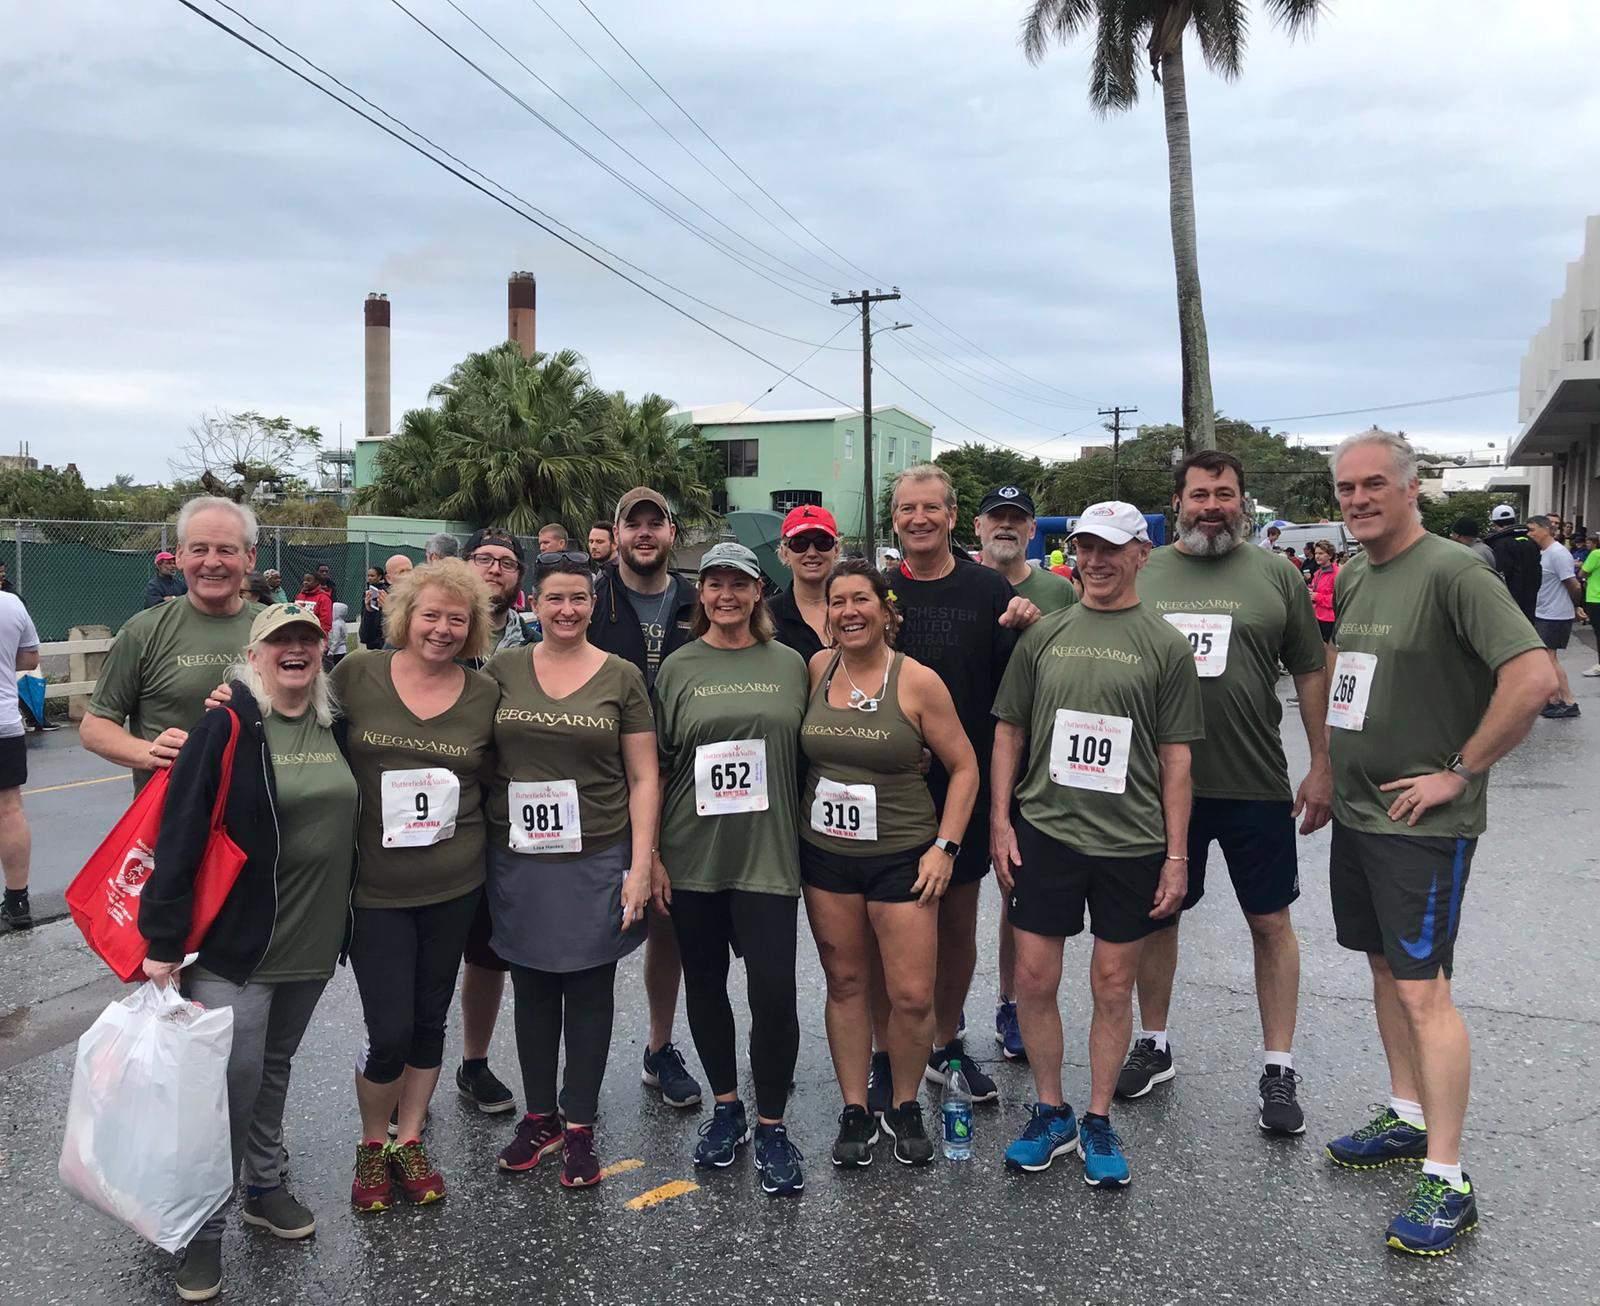 New York Brewery Brings Running Team Of 15 photo